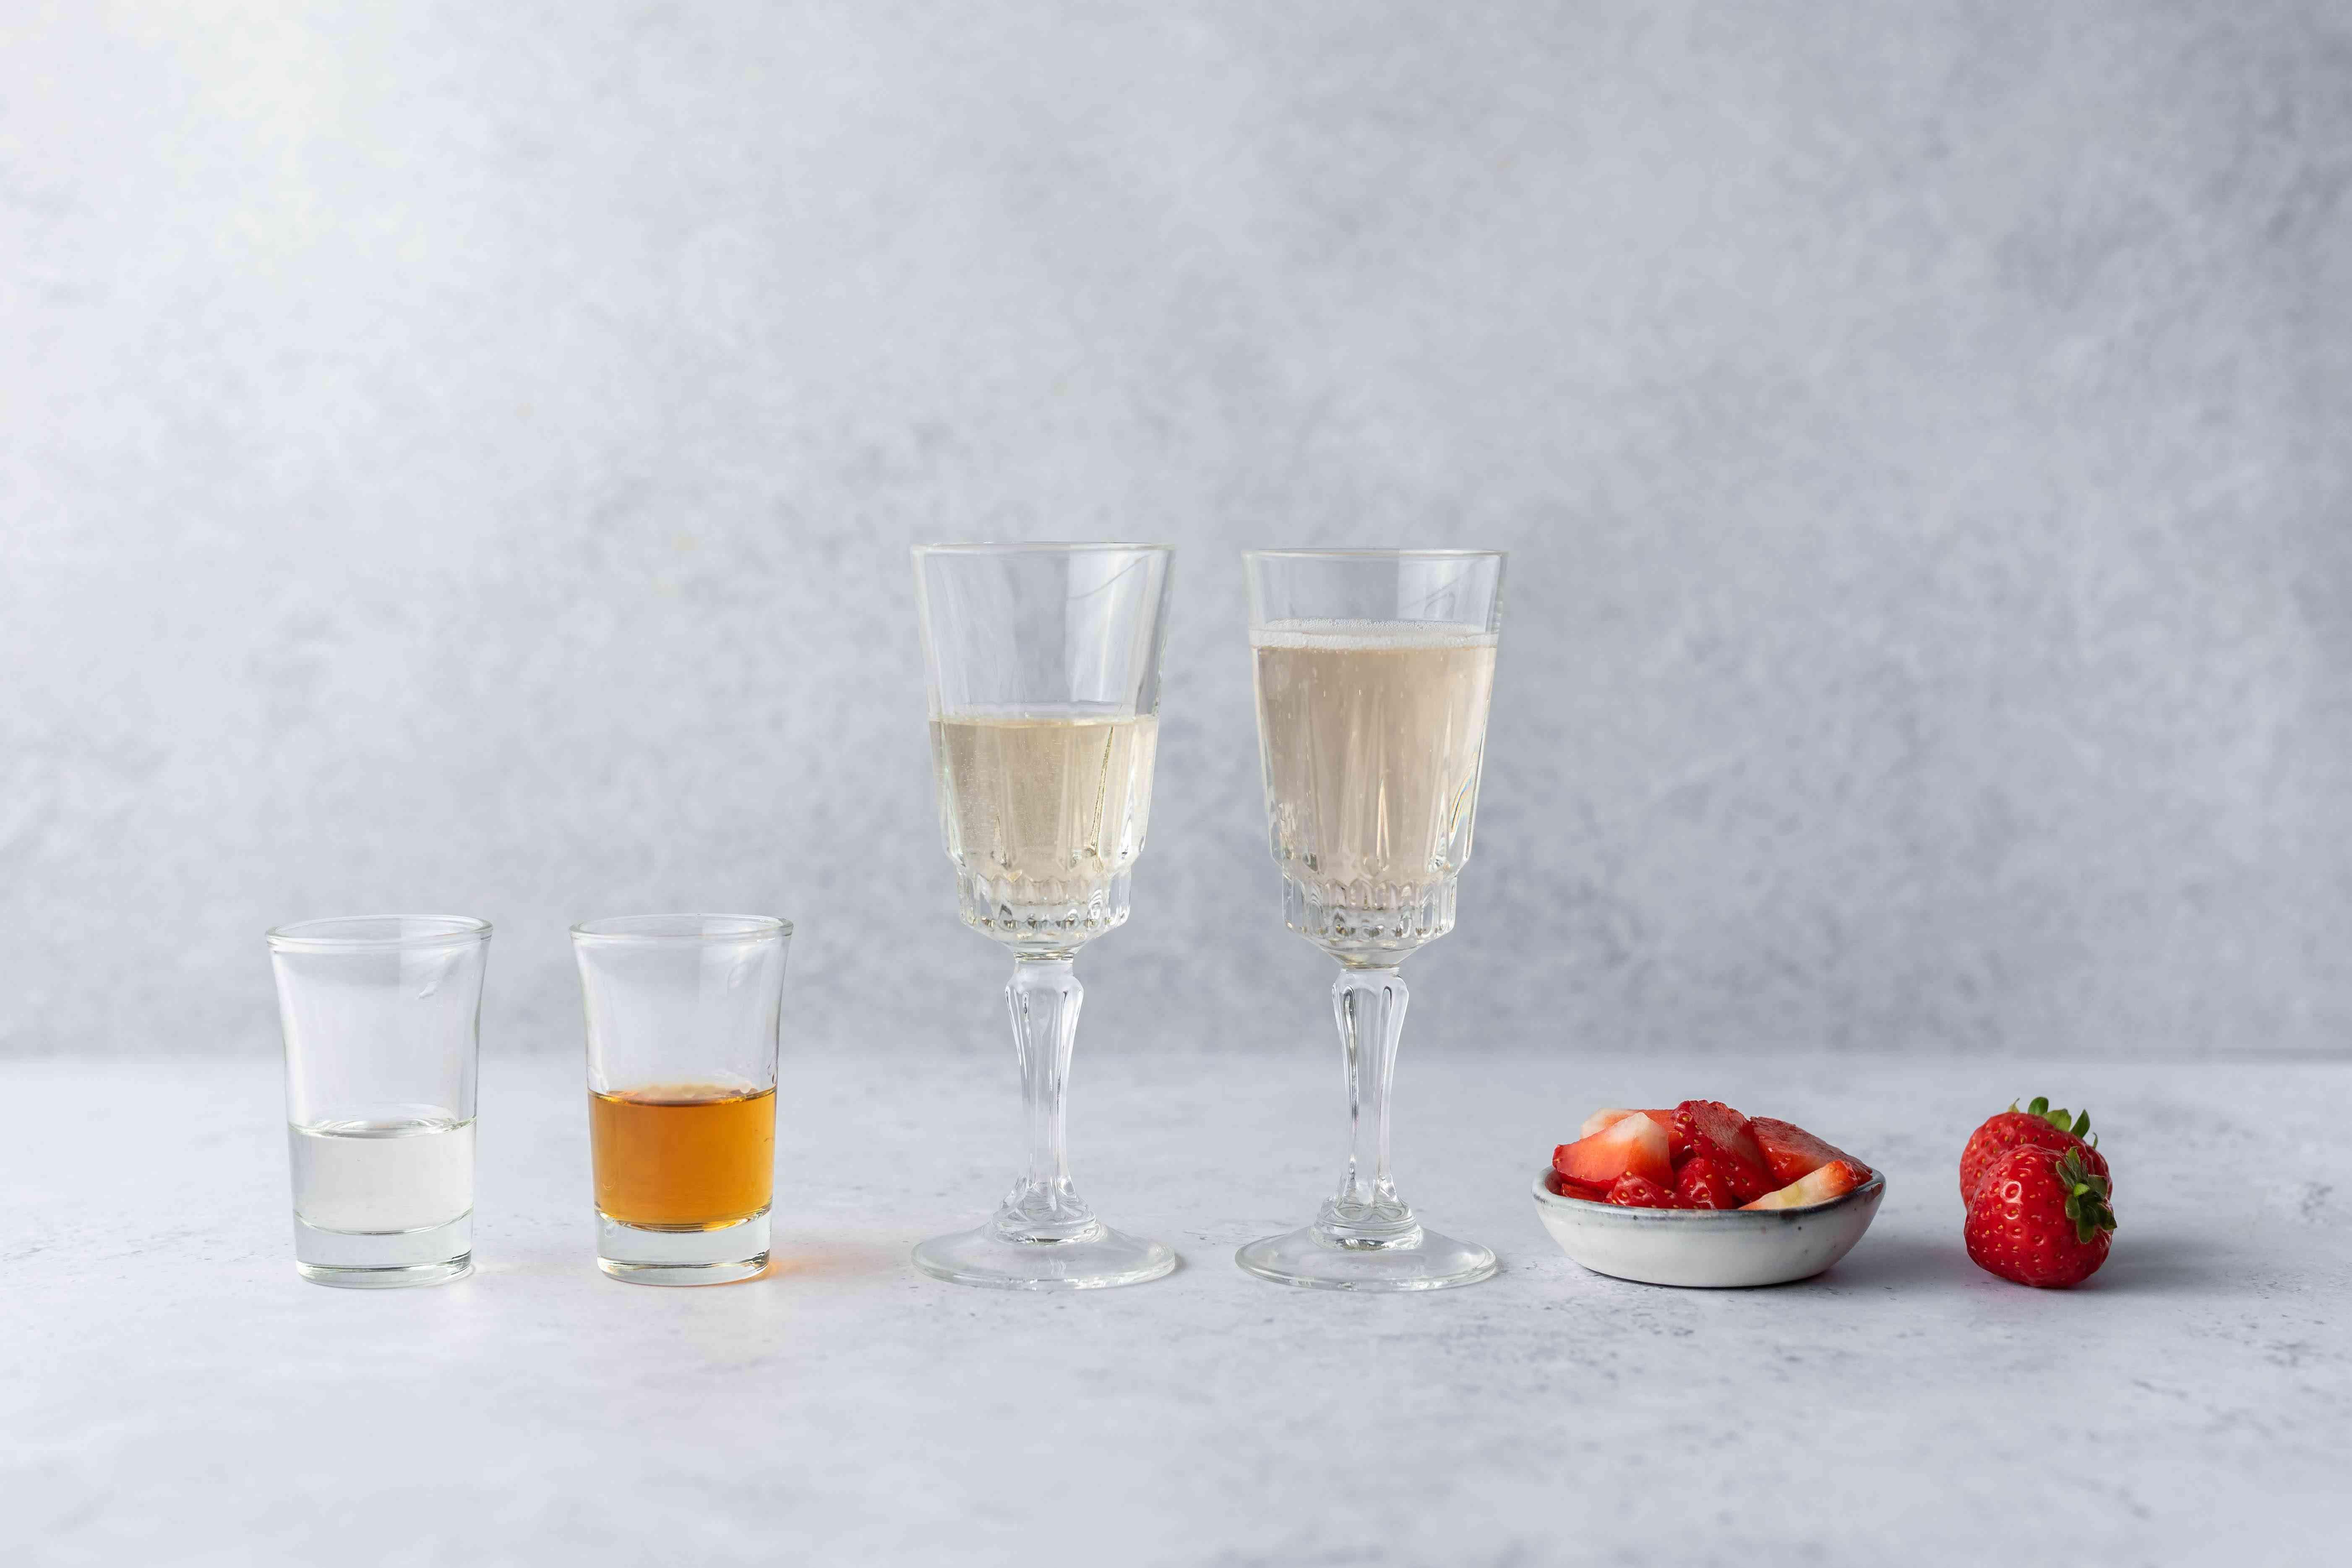 Champagne Bowler ingredients